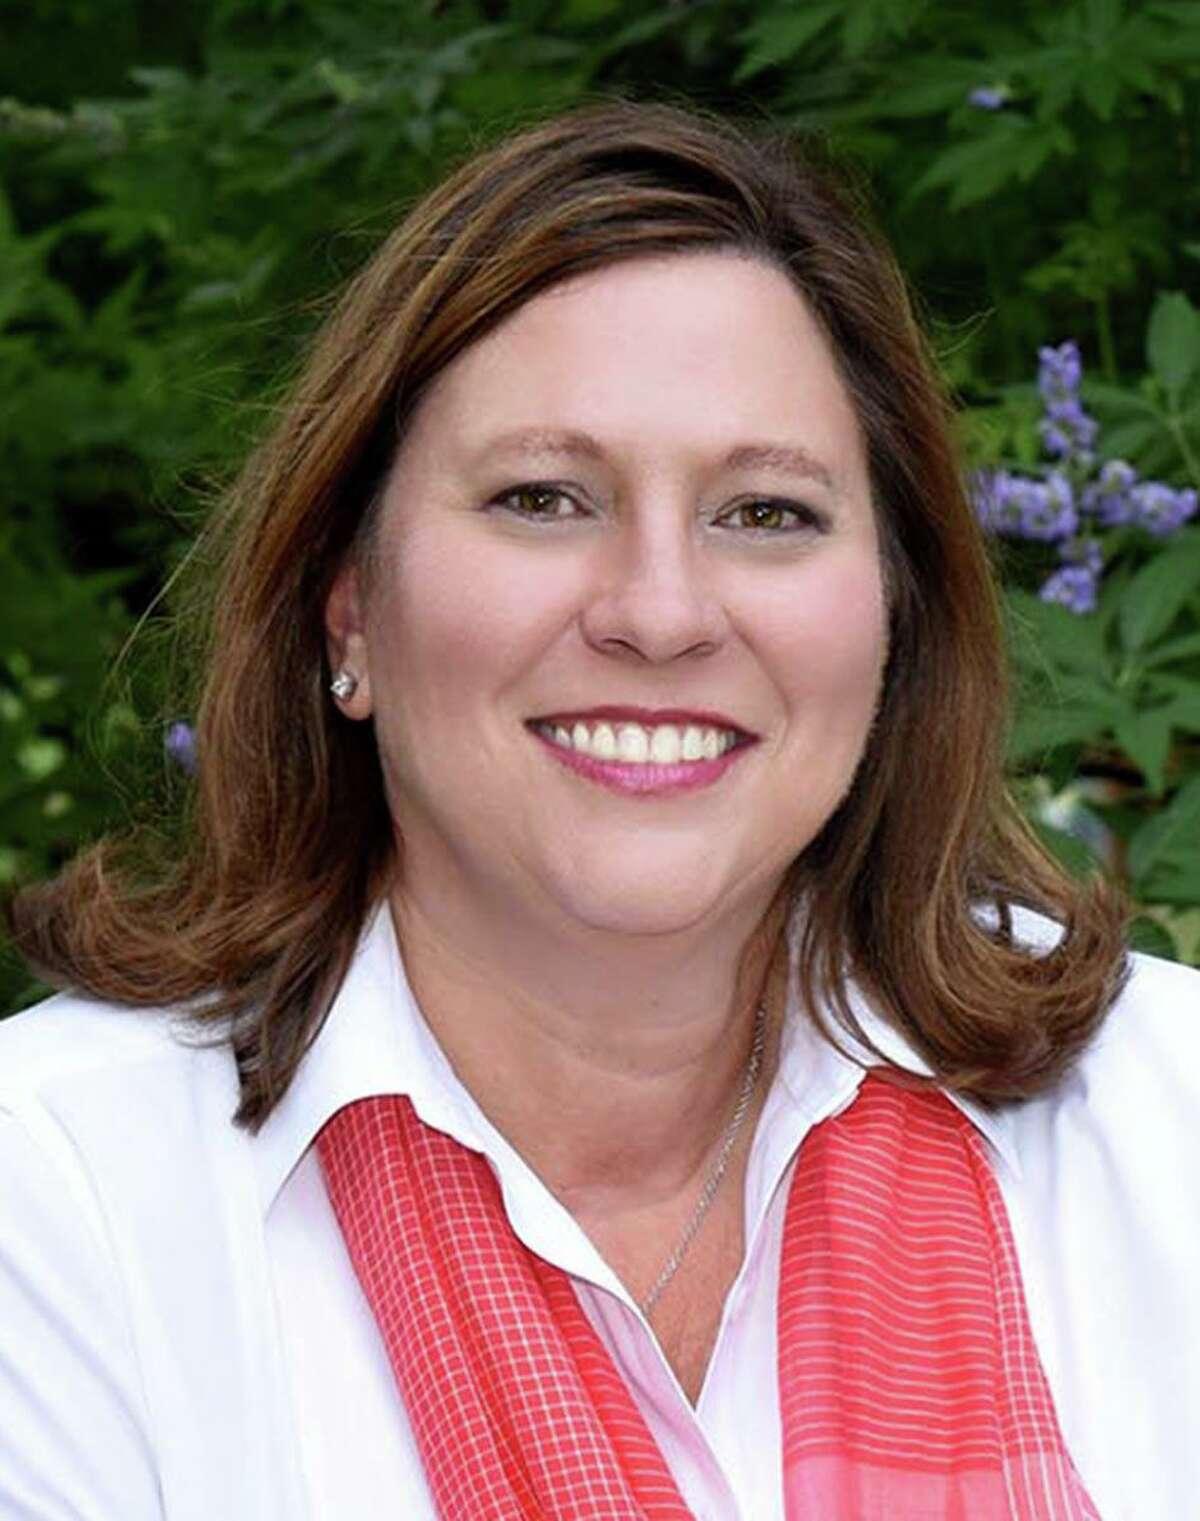 State Rep. Julie Johnson (D).